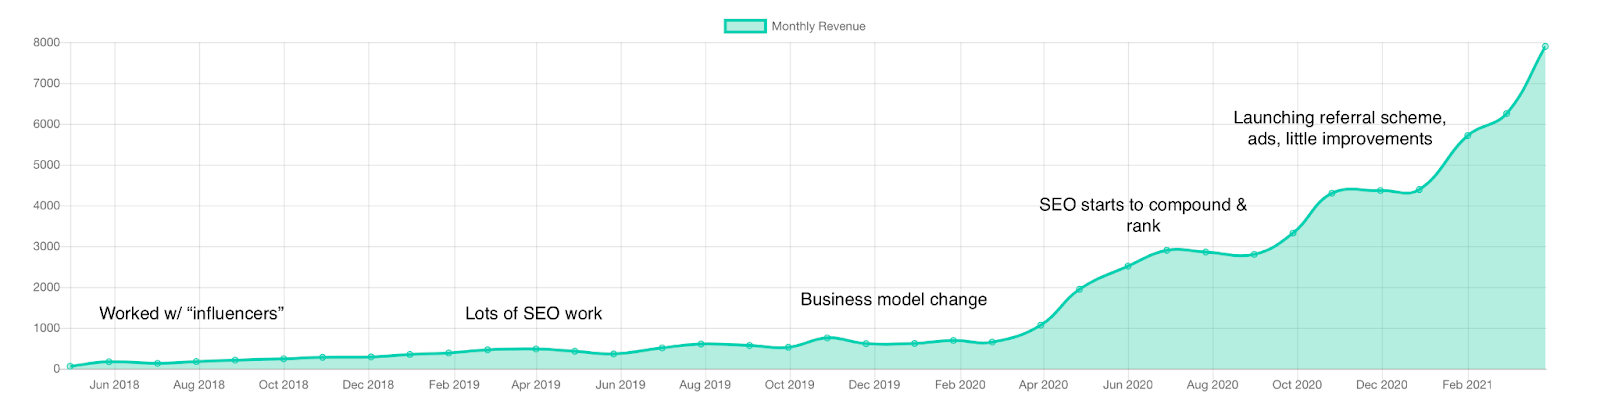 MentorCruise Montly Revenue Evolution